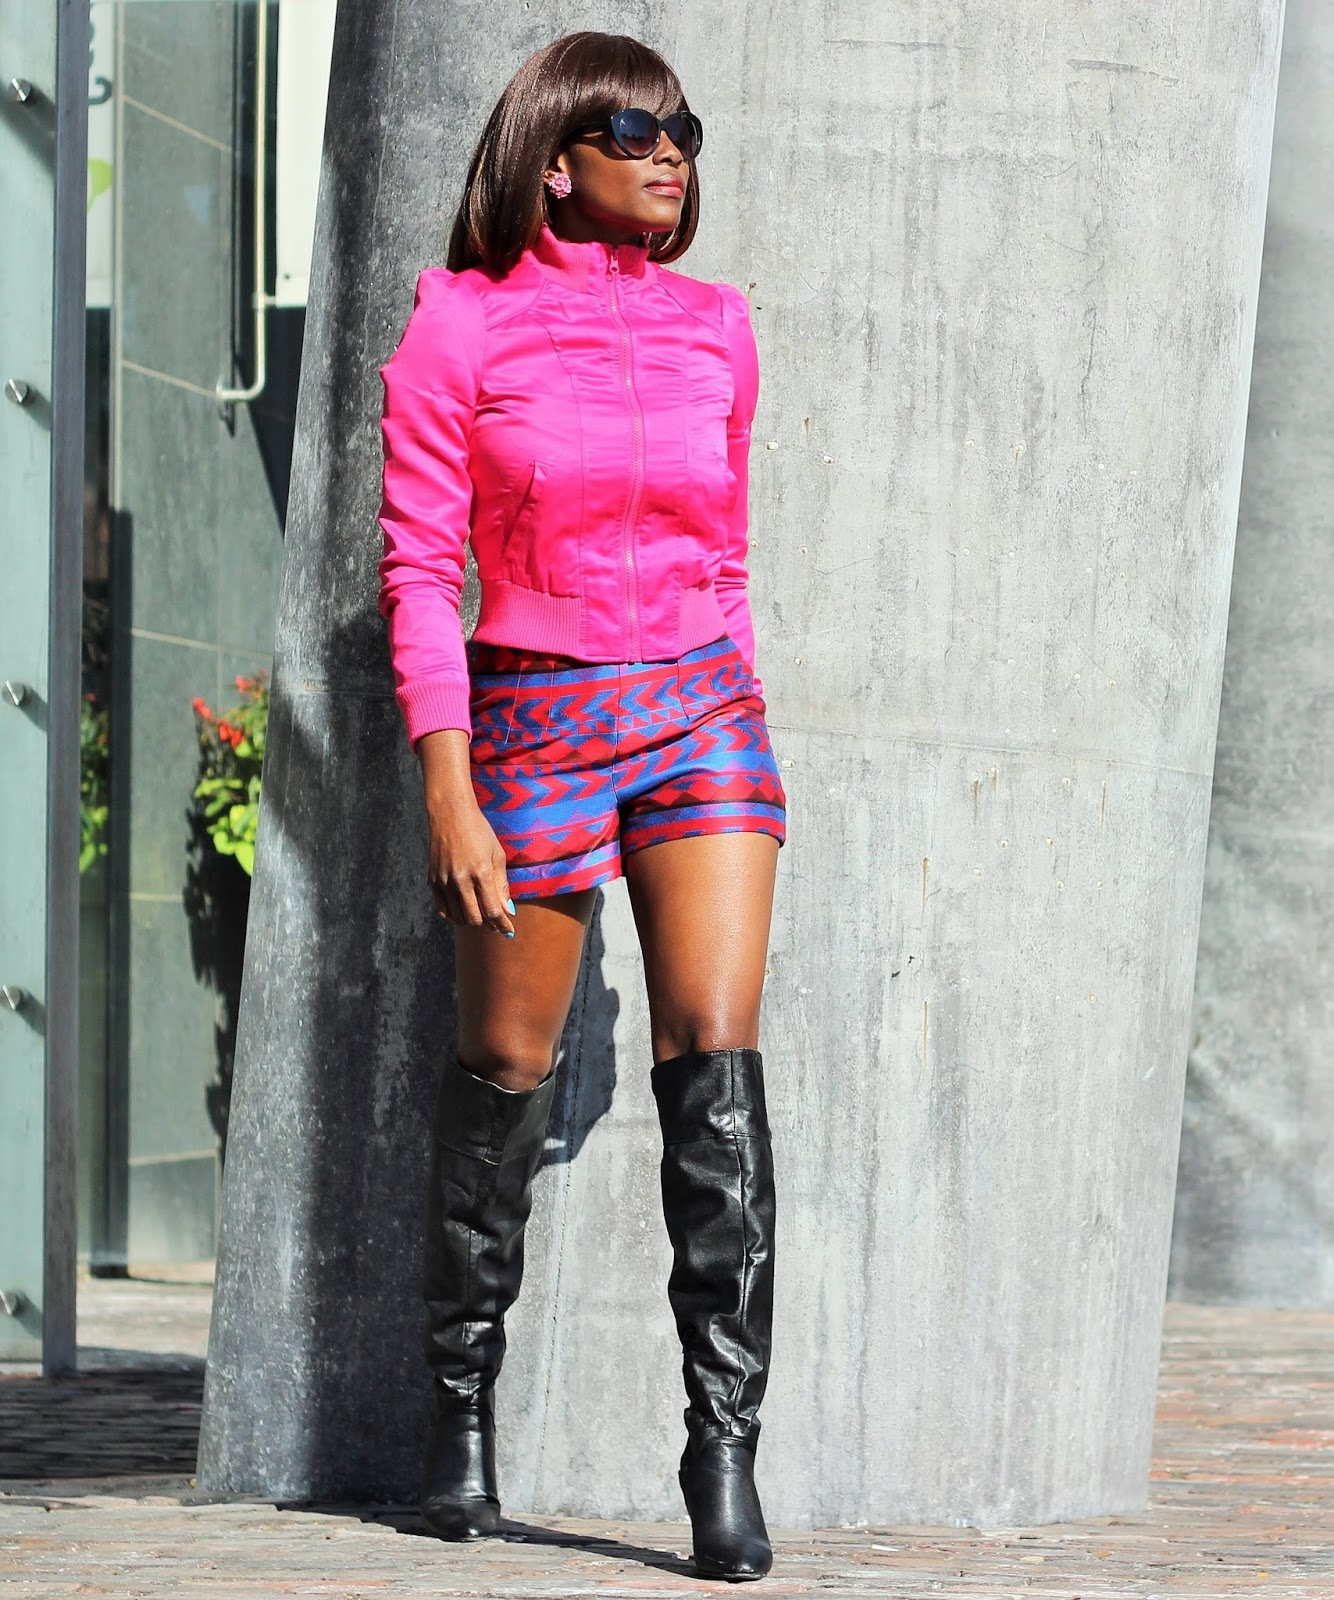 Knee High Boots x Jacket x Shorts